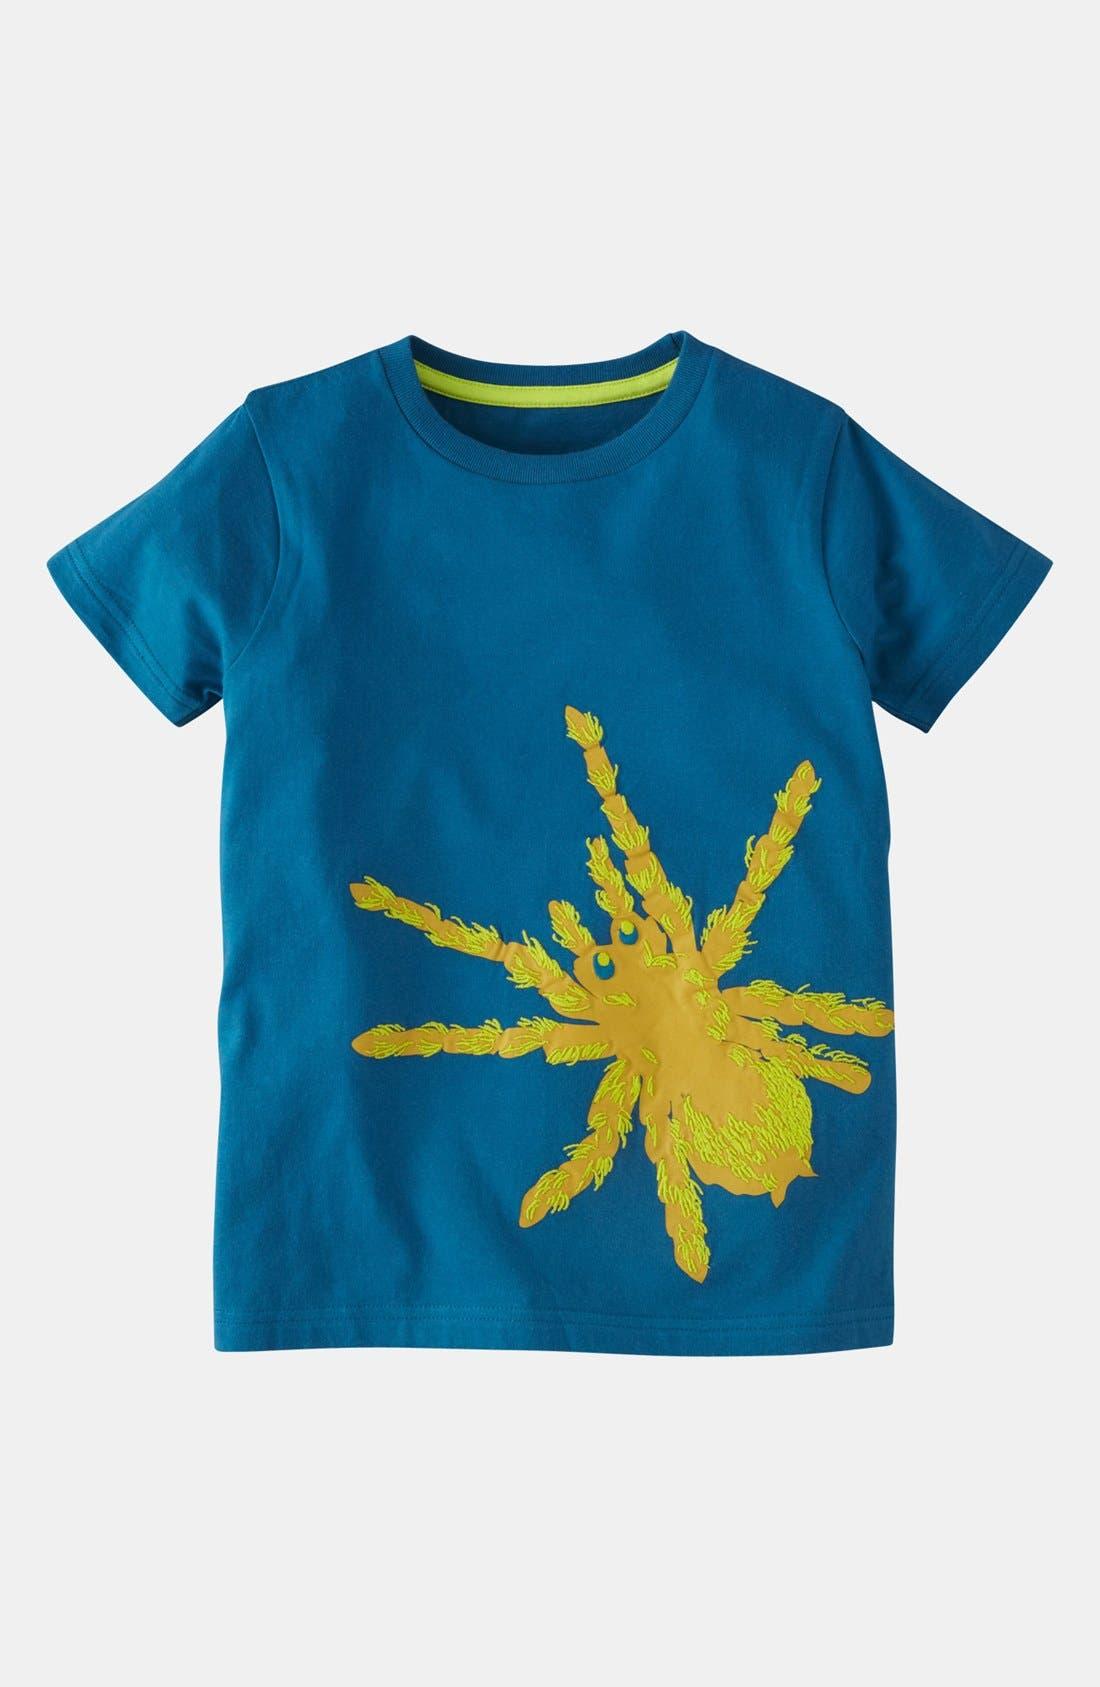 Main Image - Mini Boden 'Print & Stitch' T-Shirt (Toddler Boys)